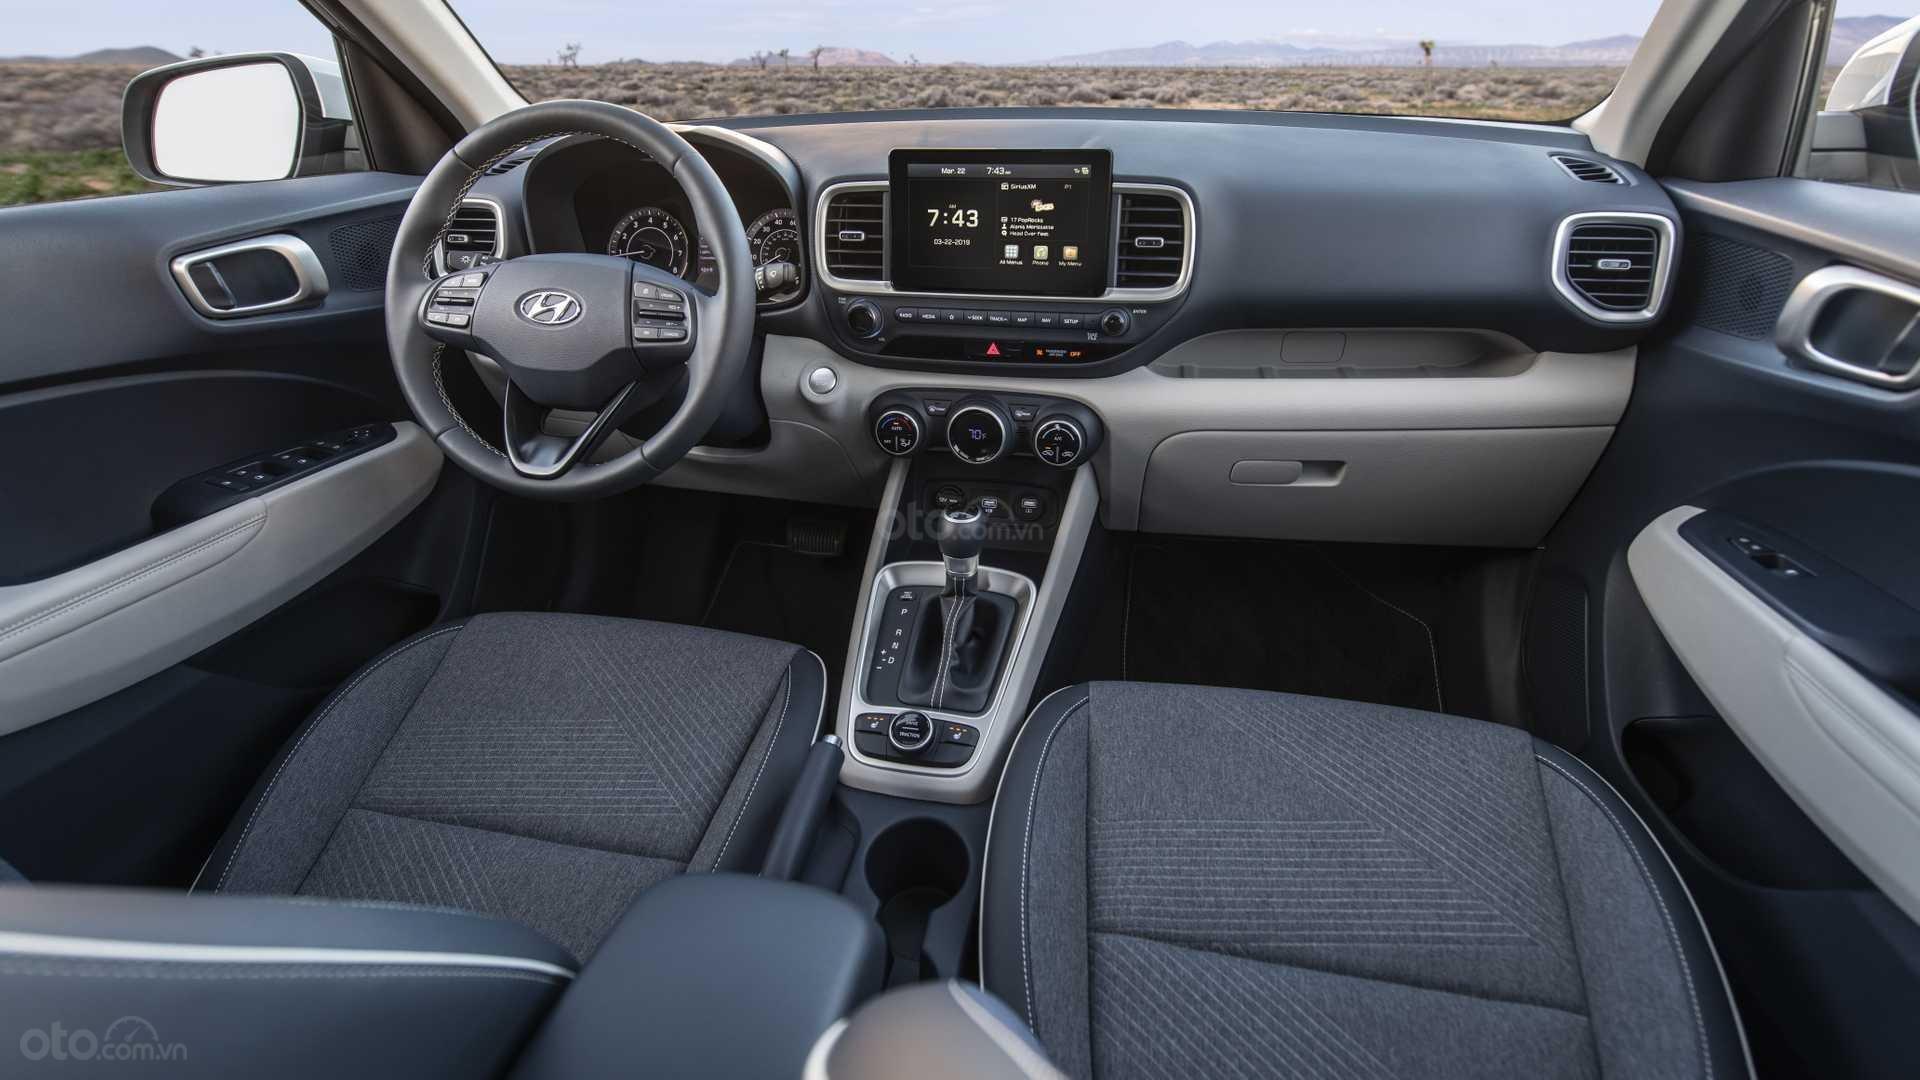 Đánh giá Hyundai Venue 2020